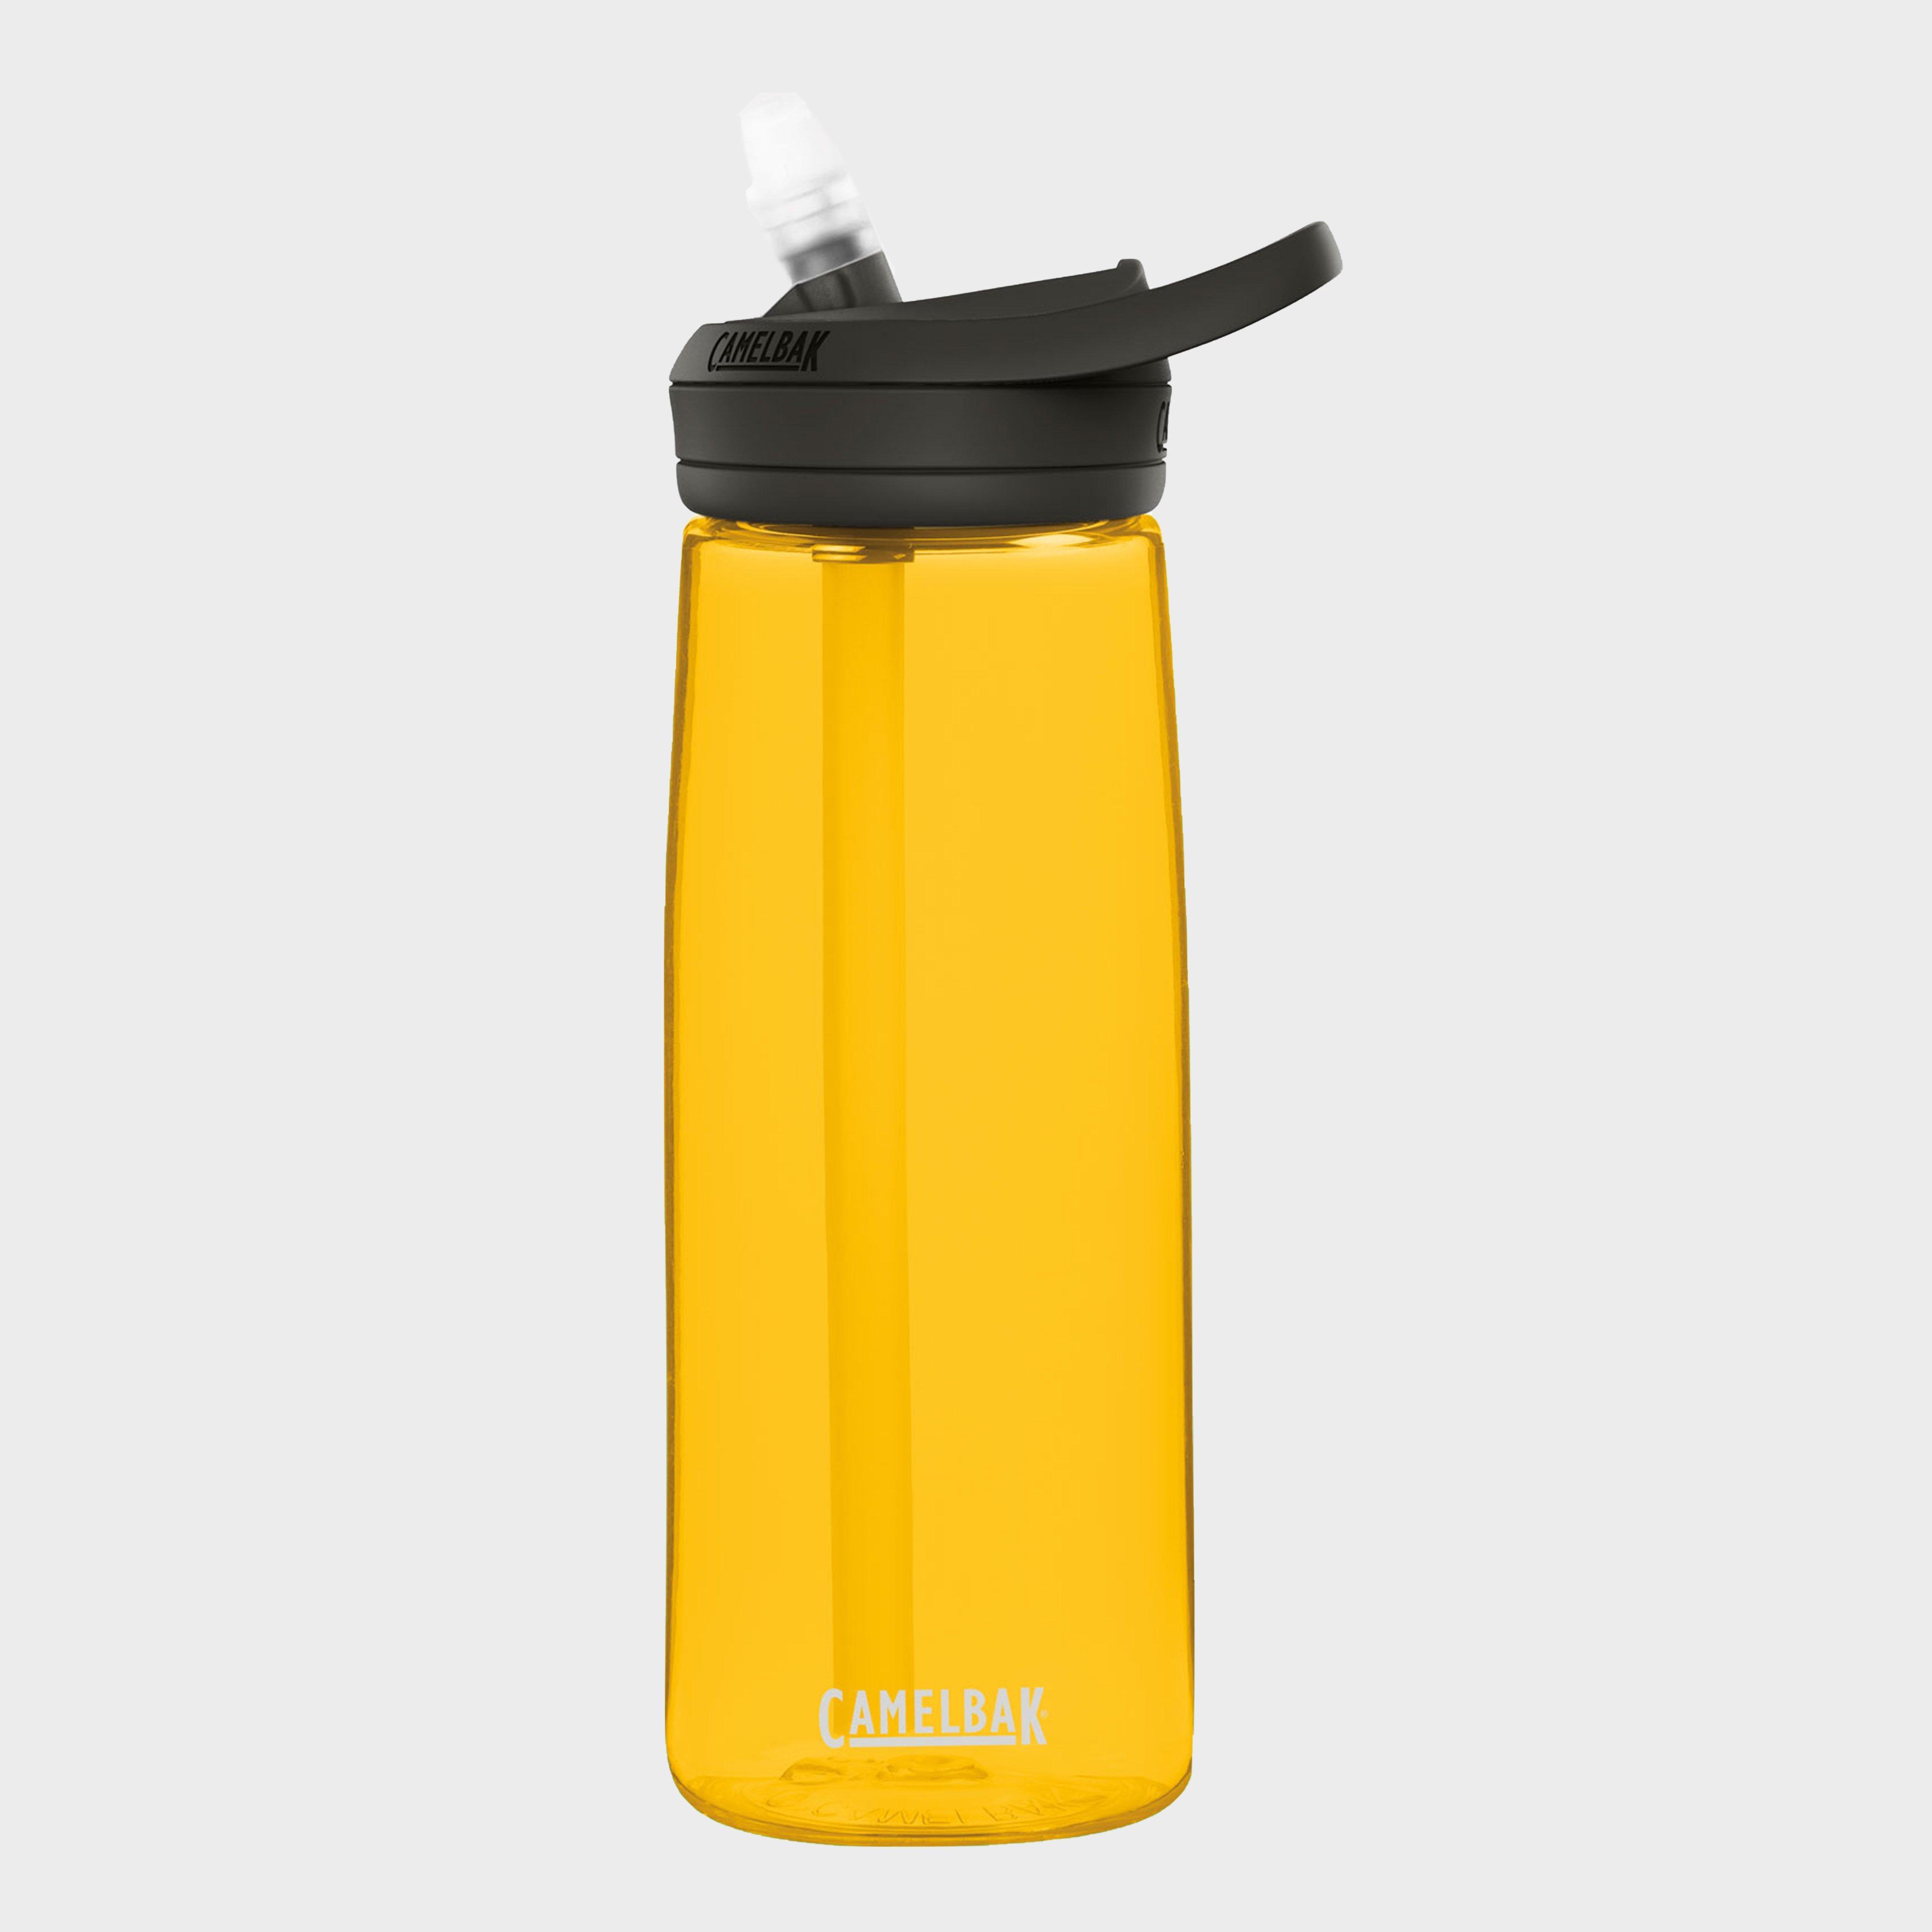 Camelbak eddy+ .75L Bottle, Yellow/0.75L